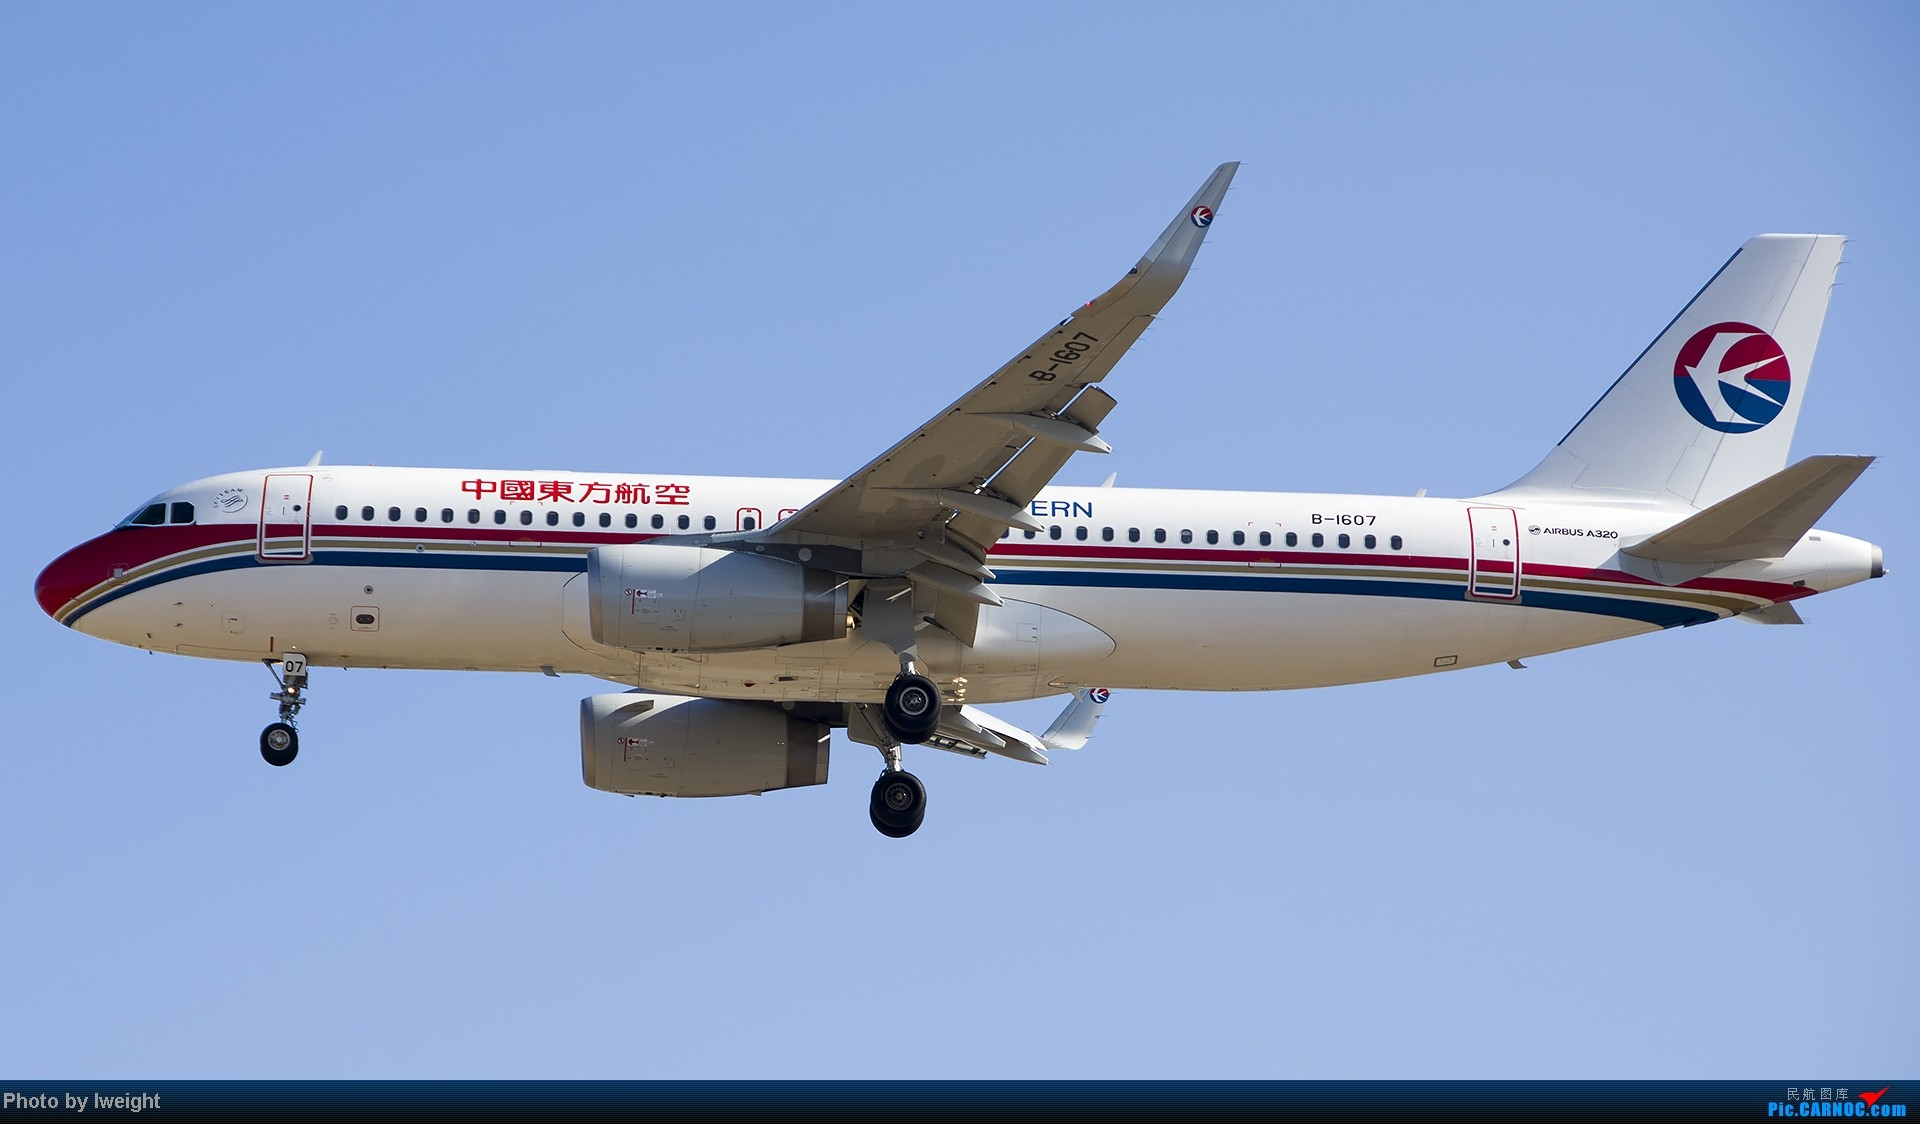 Re:[原创]抓住APEC蓝的尾巴,再拍上一组 AIRBUS A320-200 B-1607 中国北京首都机场